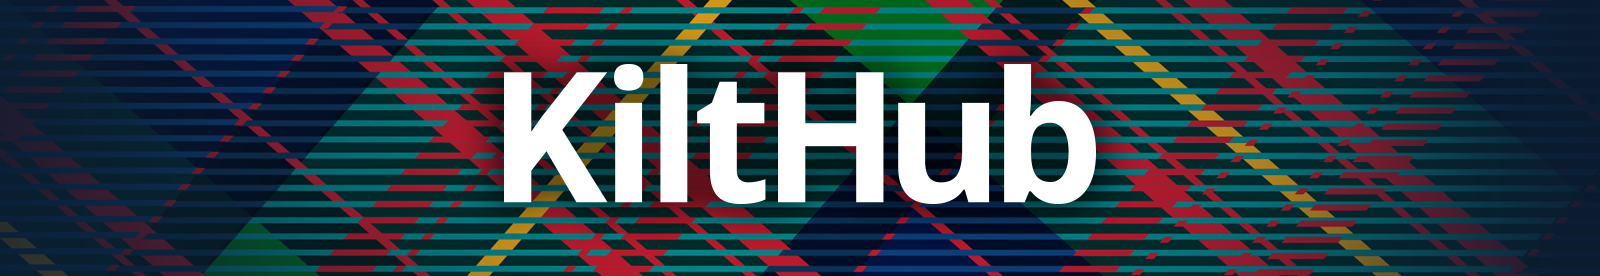 Kilthub logo on tartan background